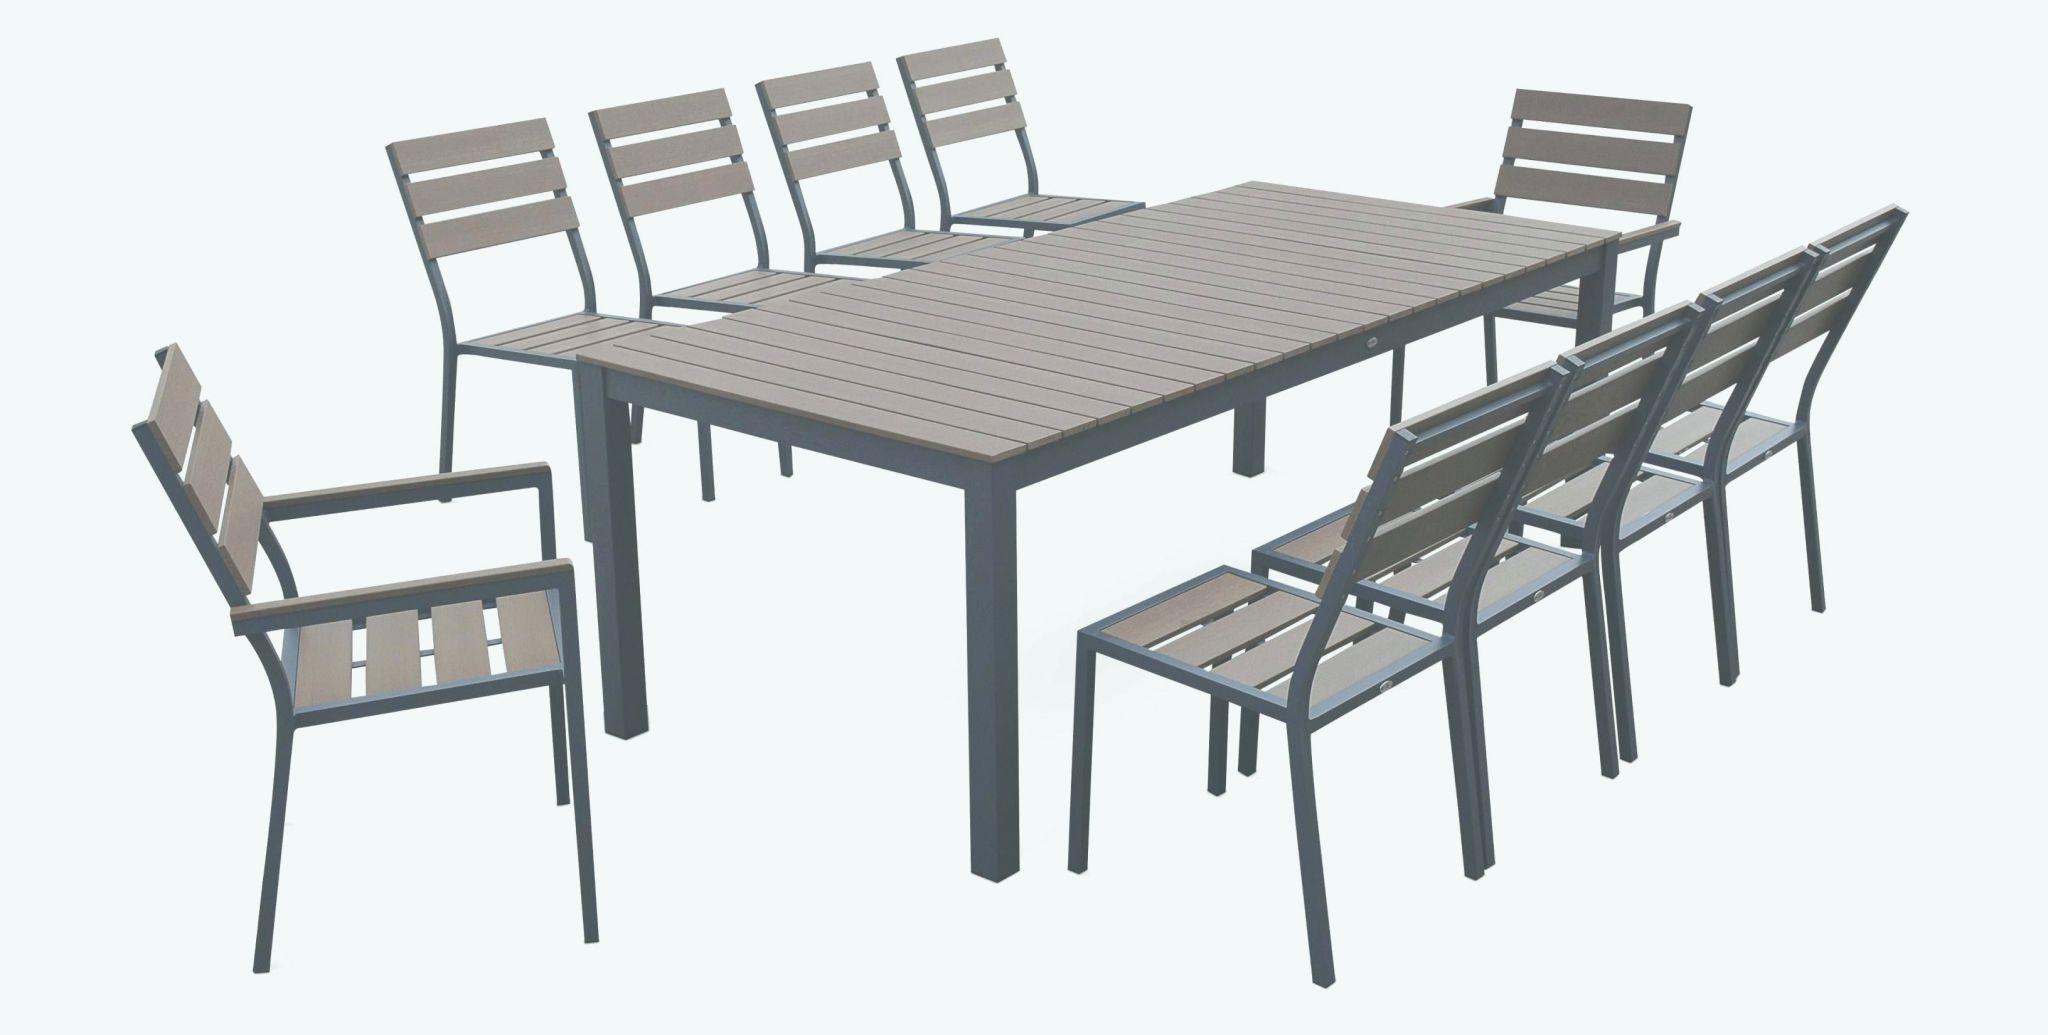 Fabricant Mobilier Jardin Ou 80 Impressionnant S De Salon ... dedans Table De Jardin Leroy Merlin